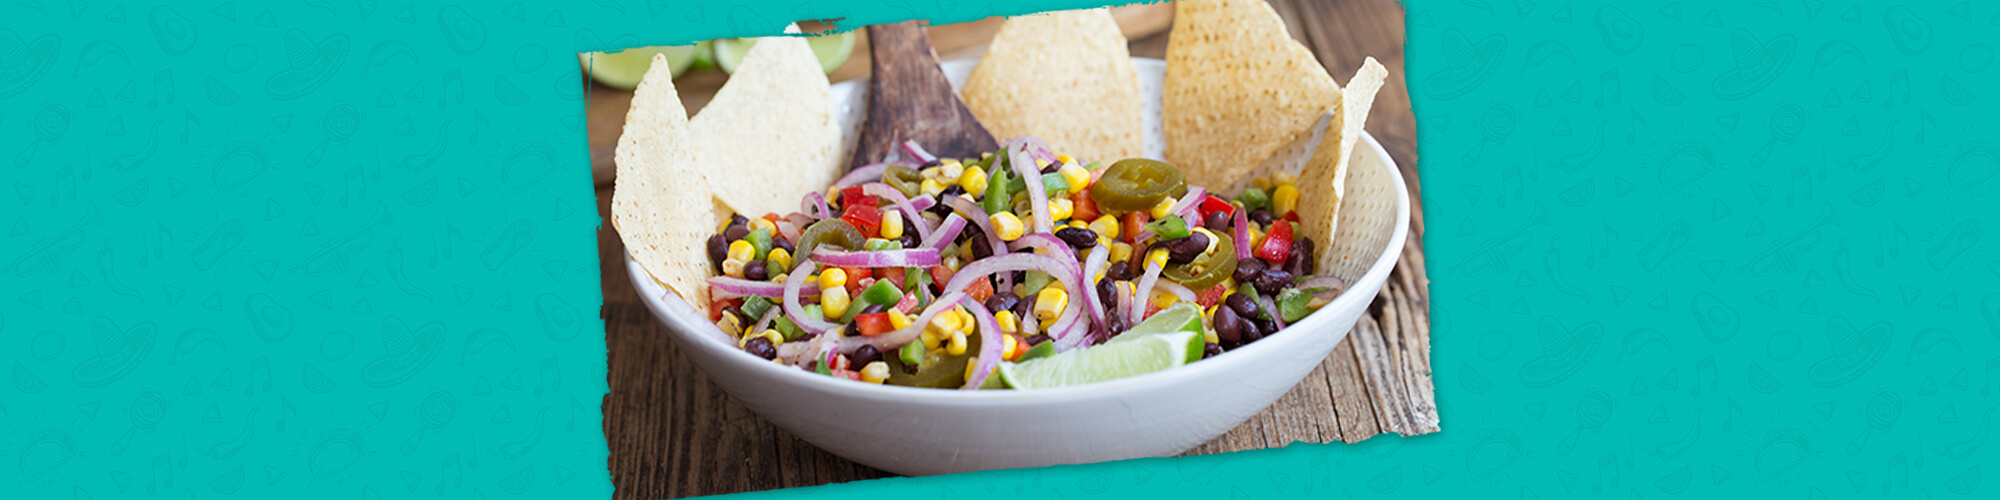 Salsas black bean and corn salad